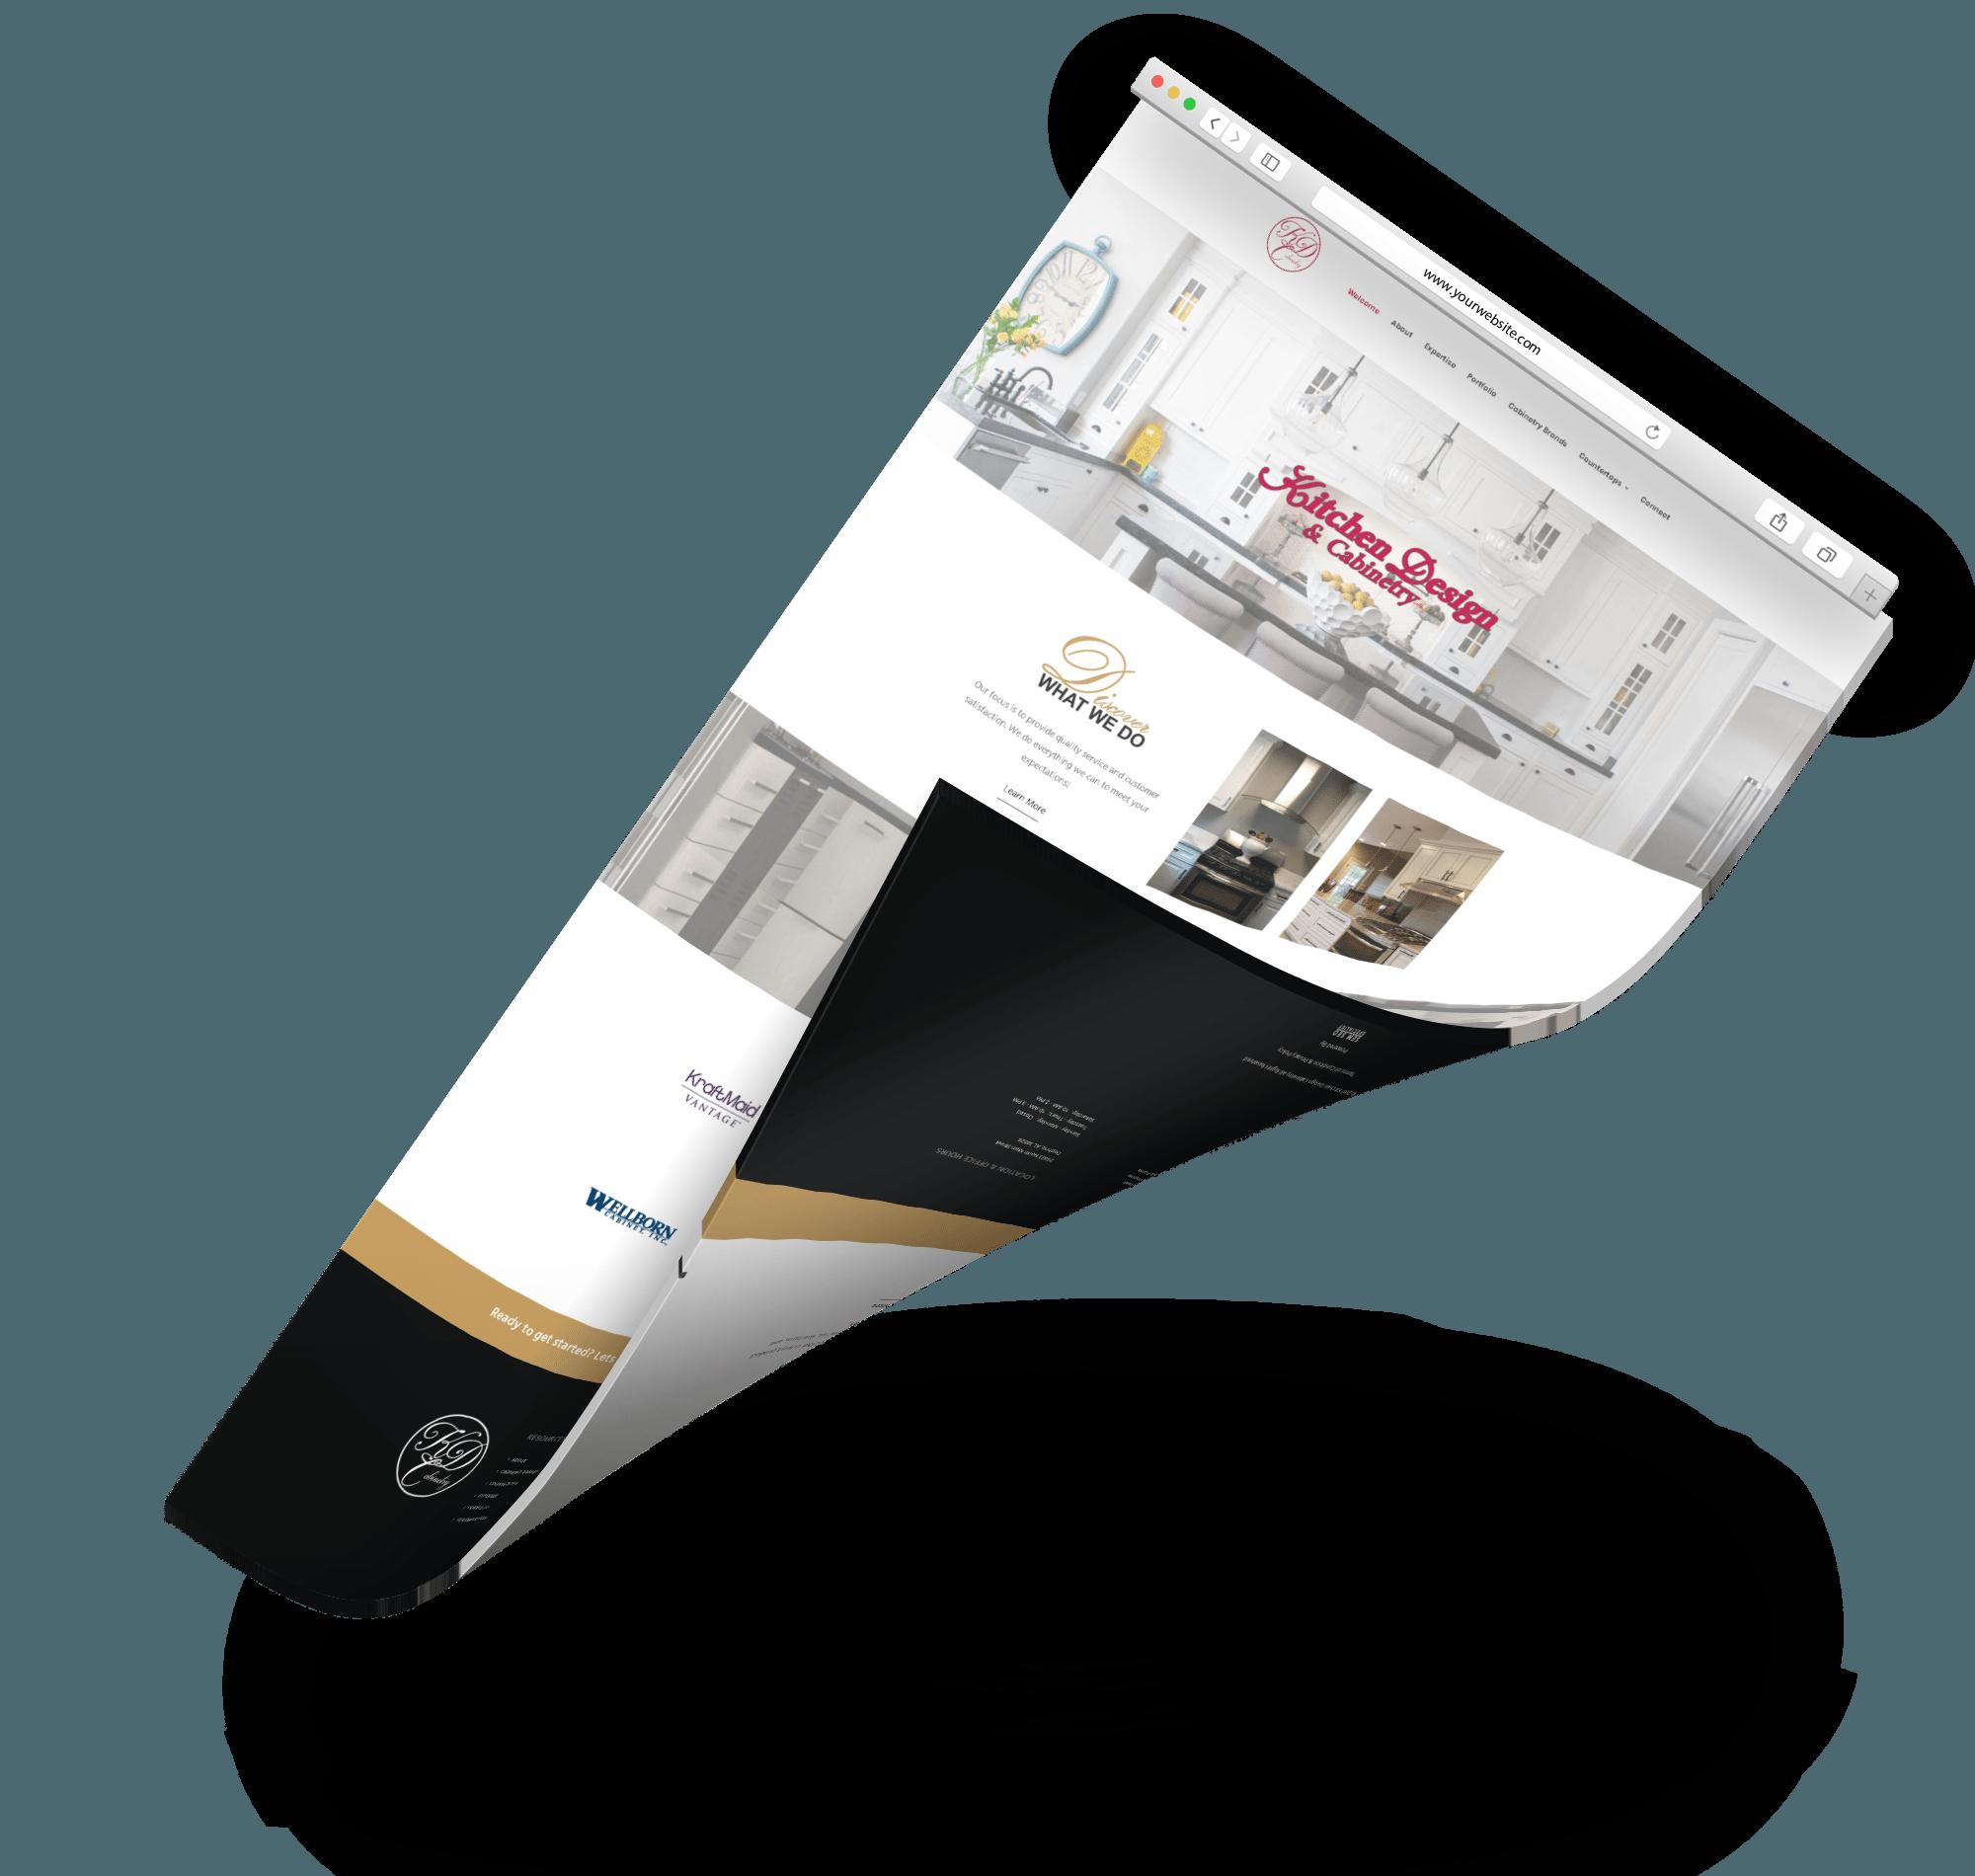 Kitchen design cabinetry web design